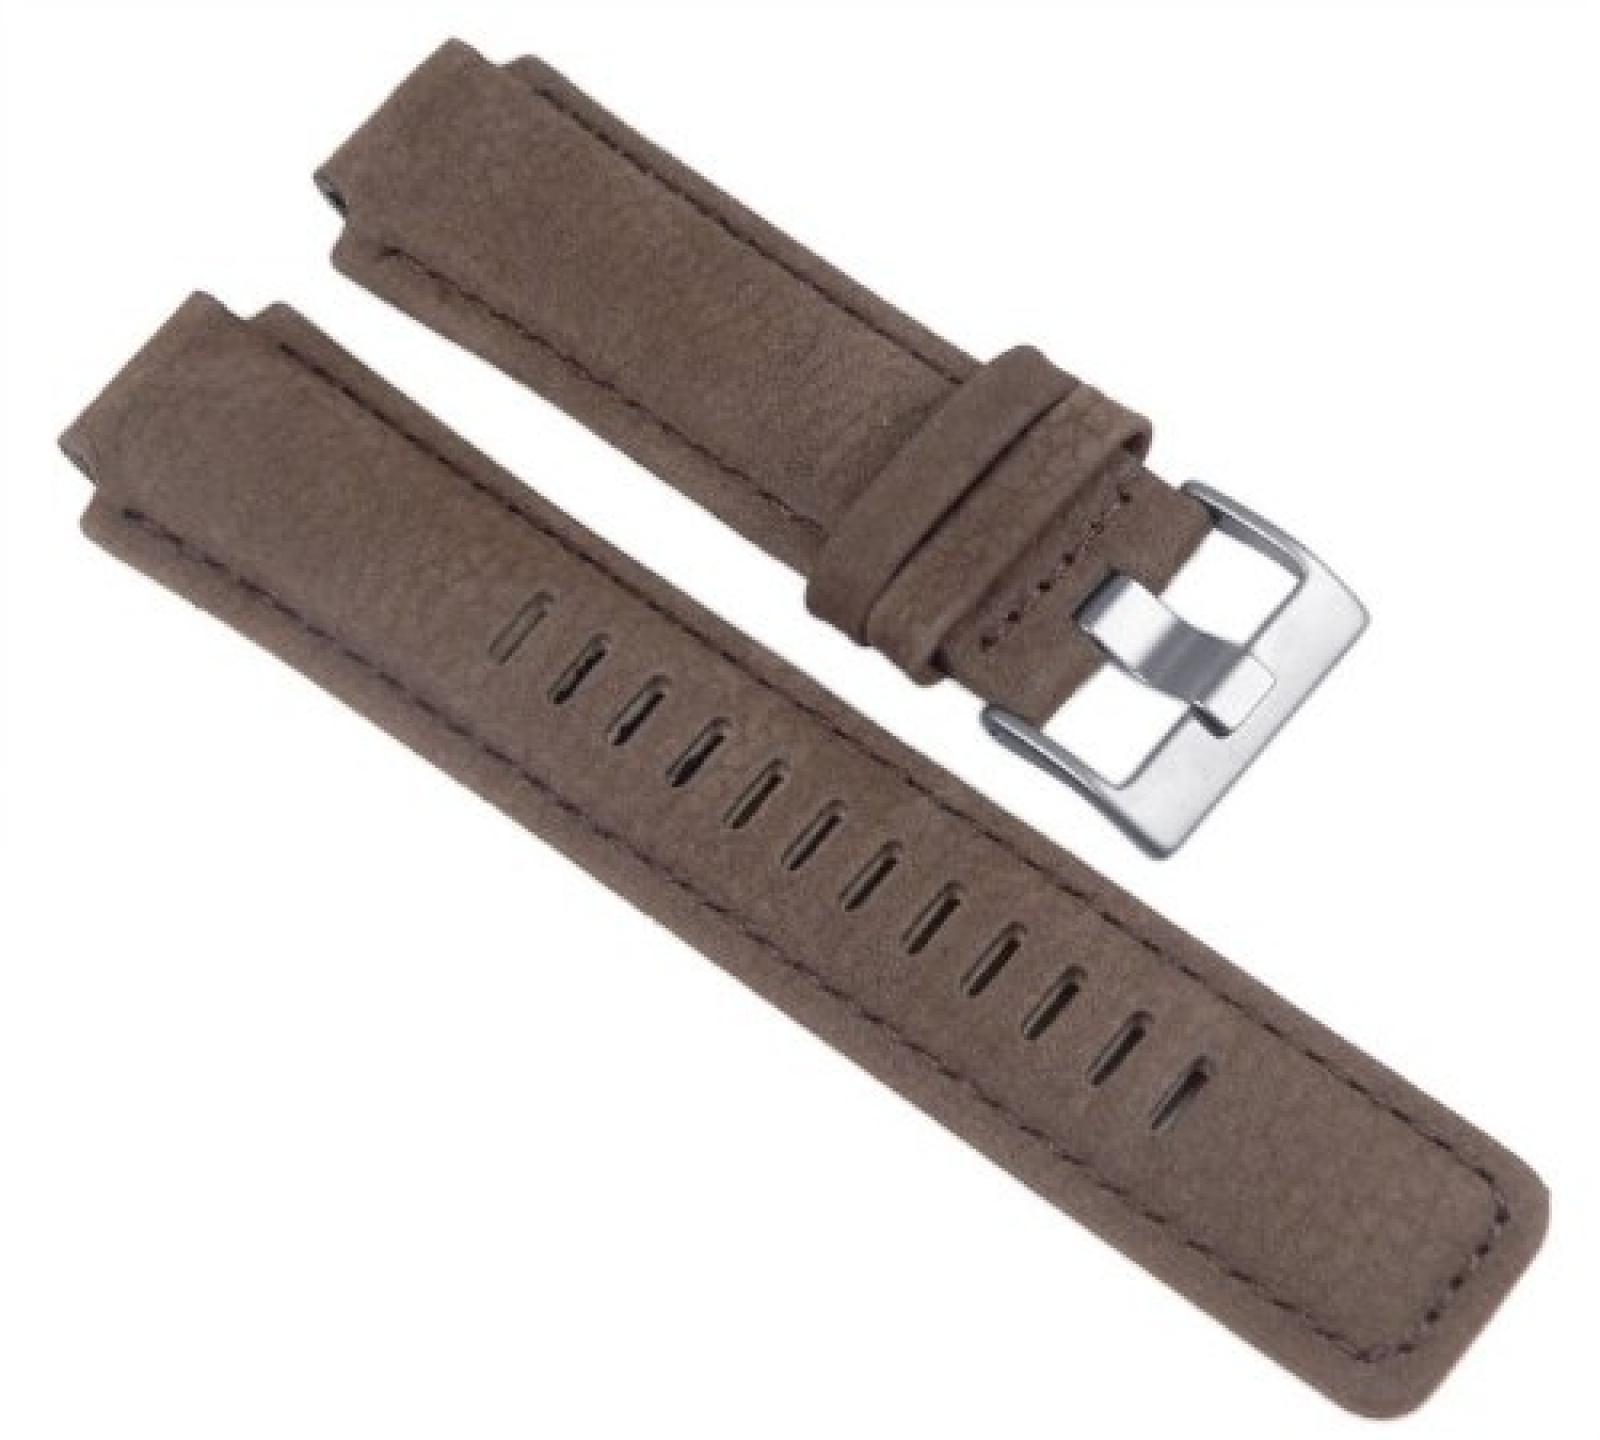 Timex Marken Ersatzband Uhrenarmband Leder Wasserfest Braun 16mm für T2N721, T2N739, T2P141, T2N720, T2N722, T2N723, T49709